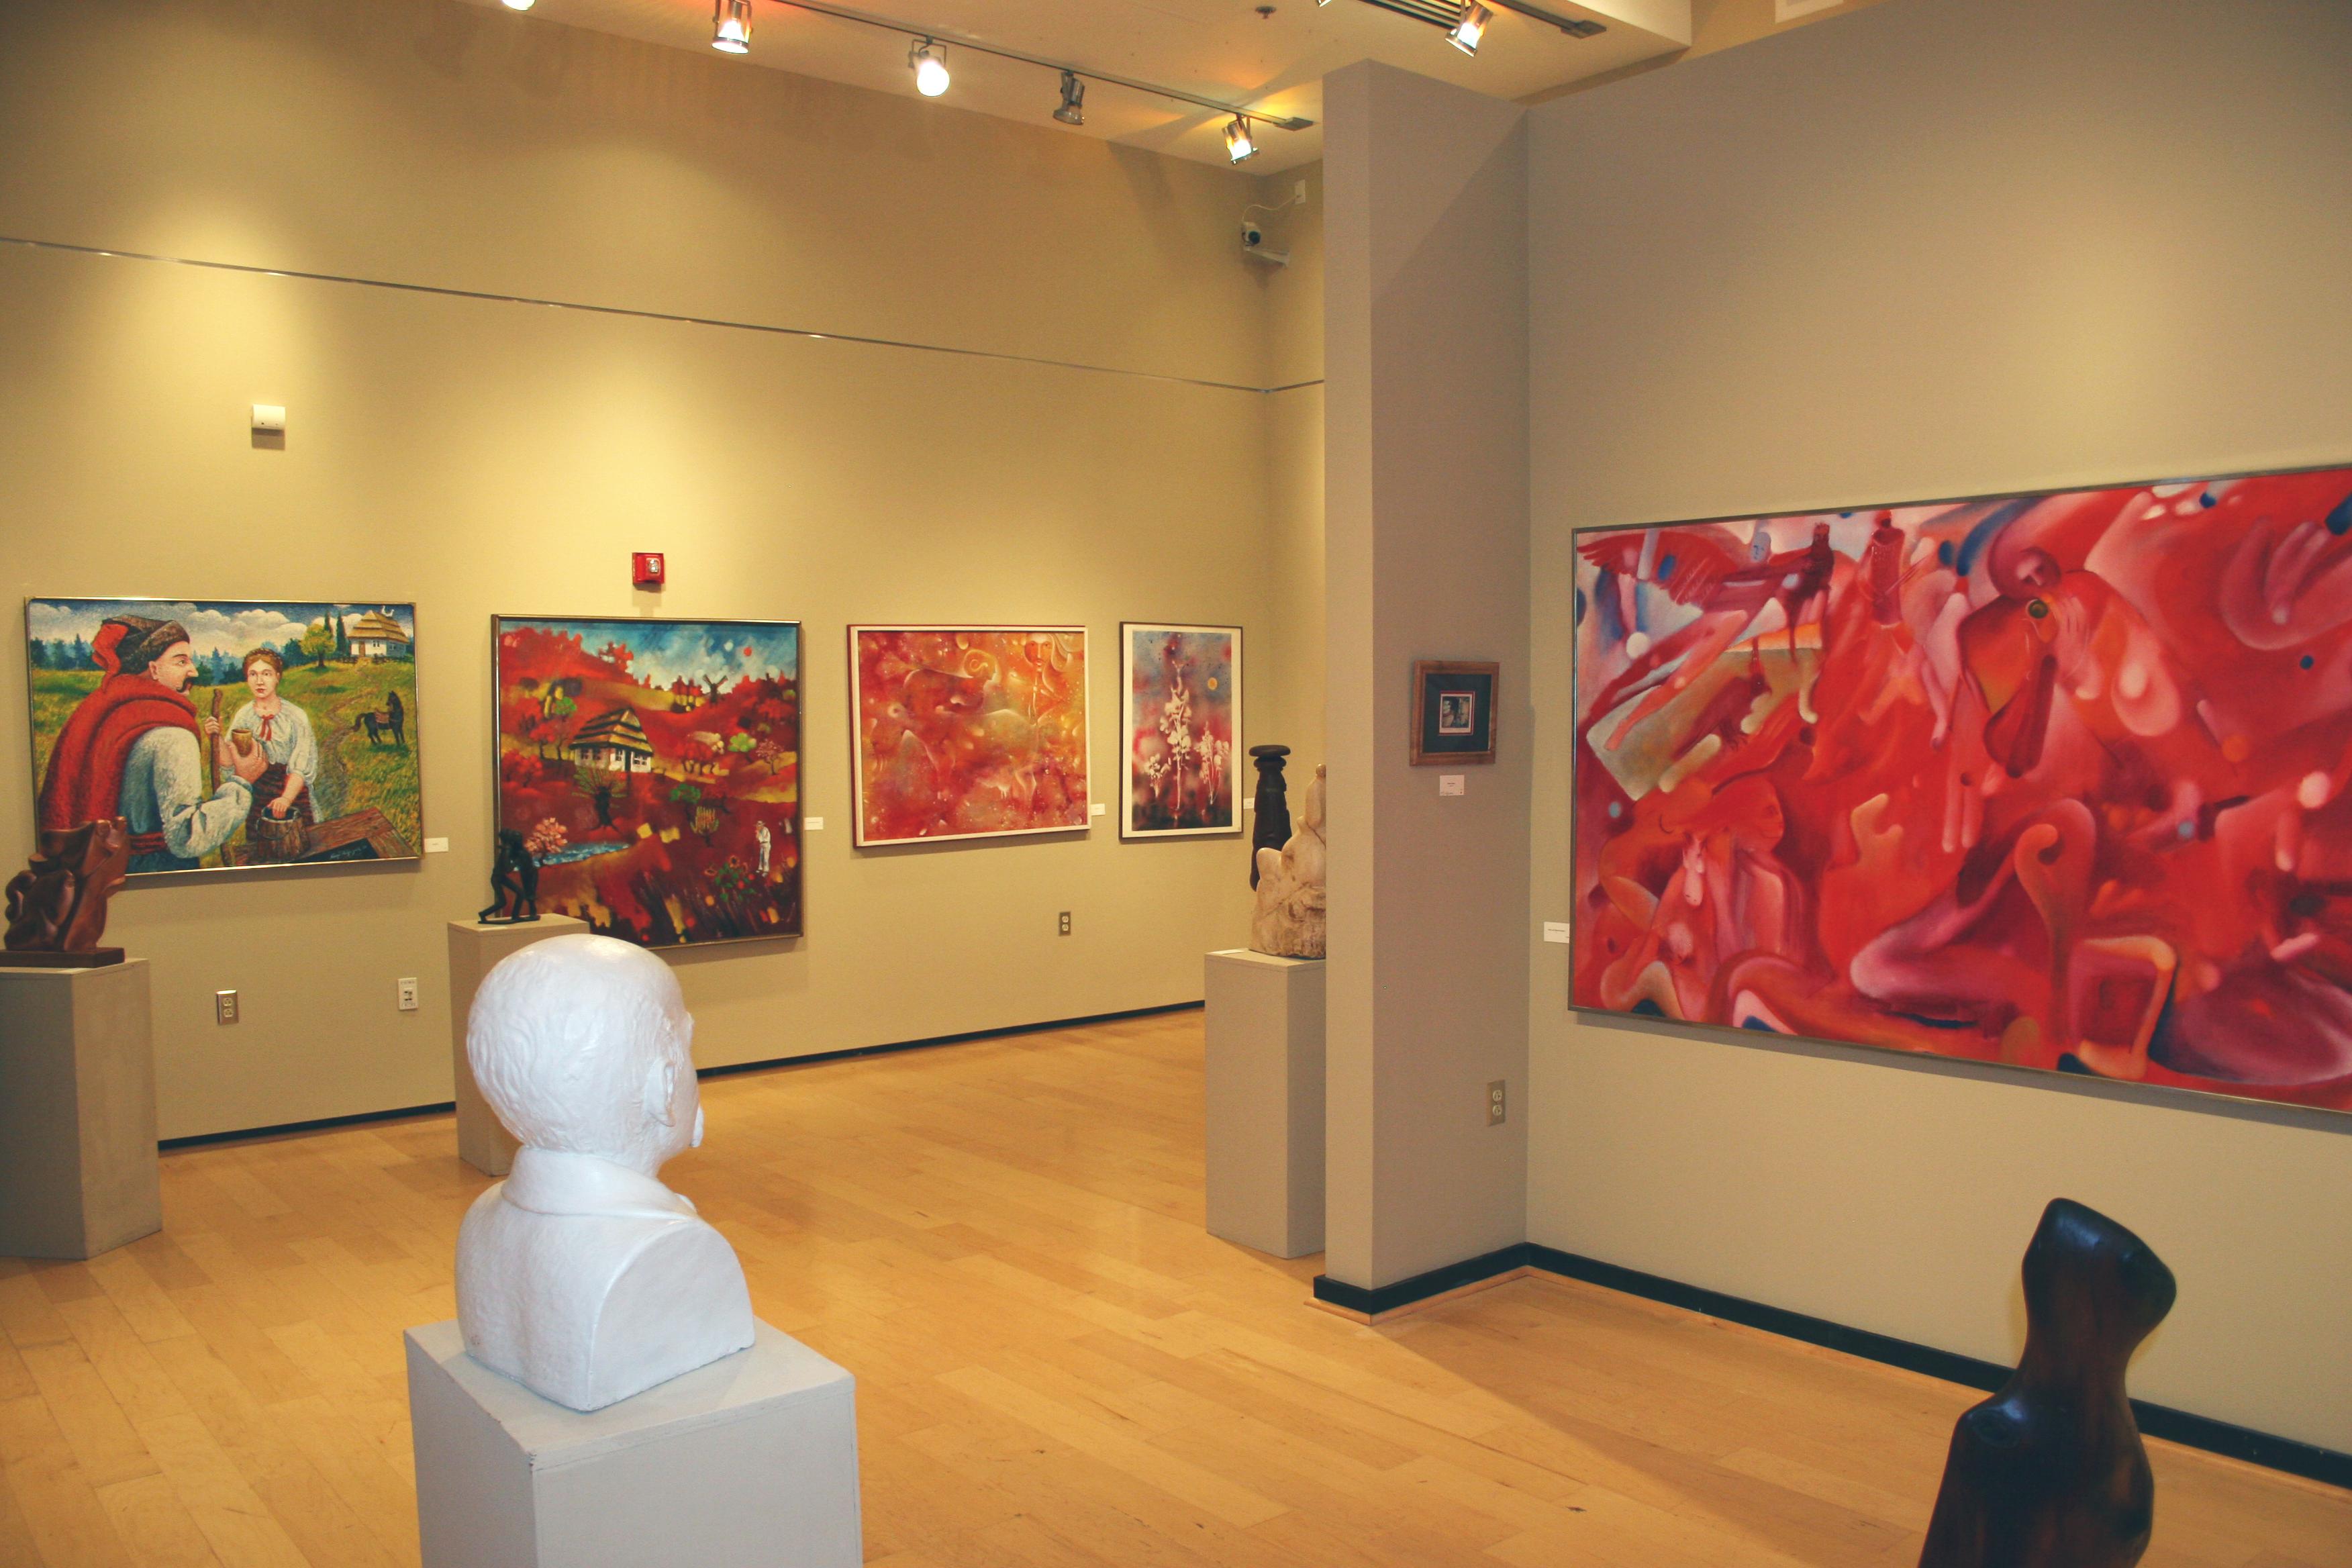 art galleries exhibits